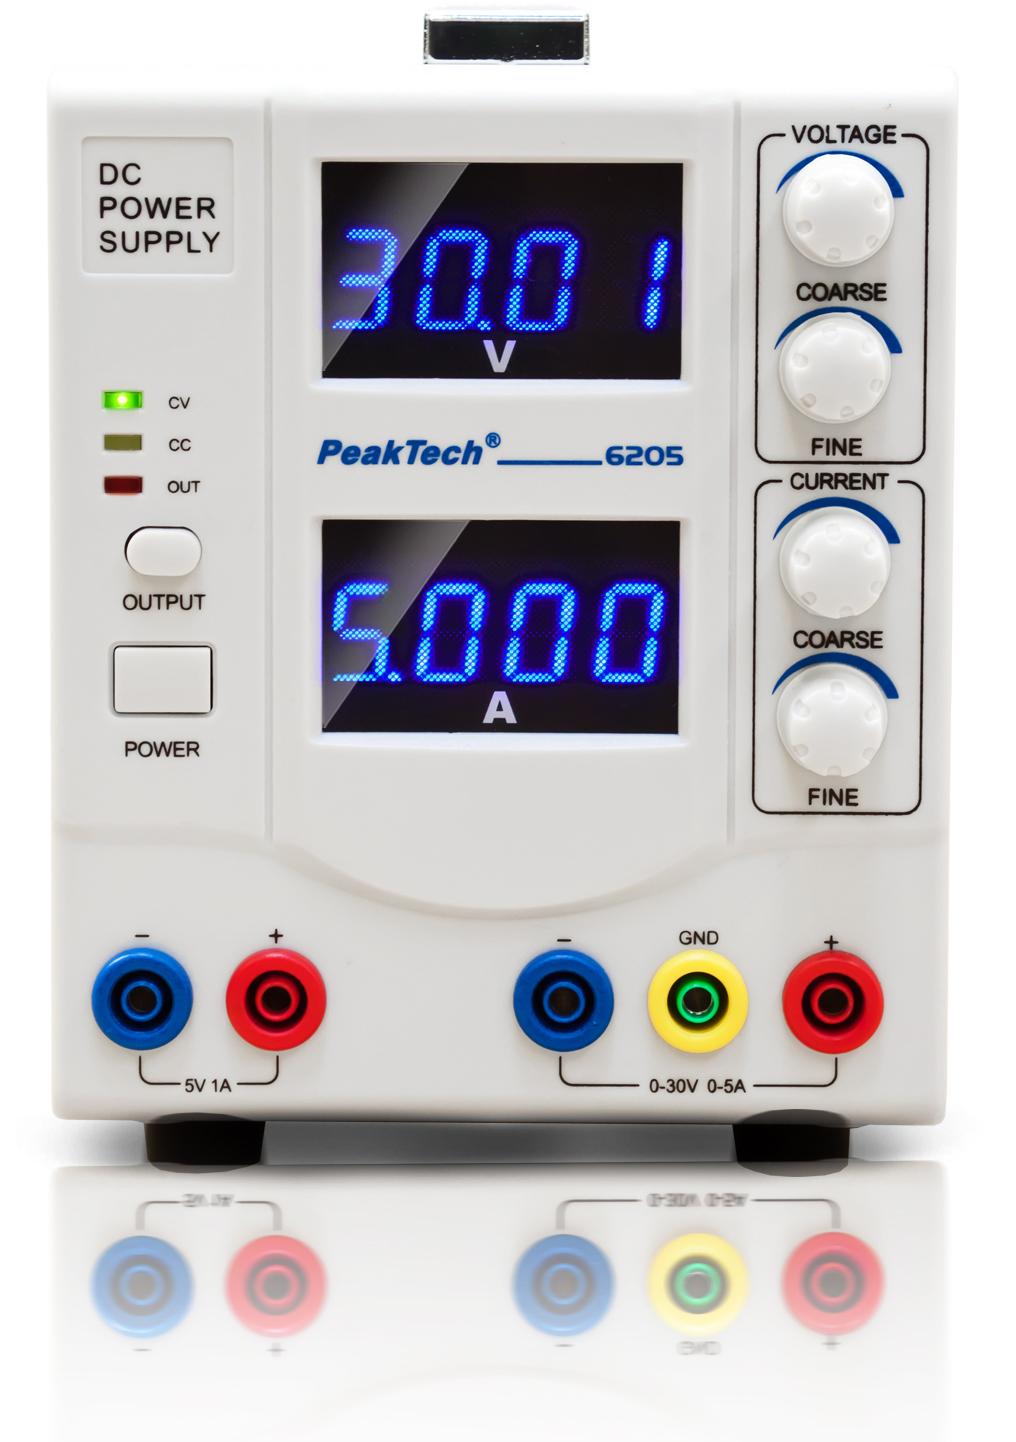 «PeakTech® P 6205» Digital Power Supply, 0 - 30 V/0 - 5 A DC